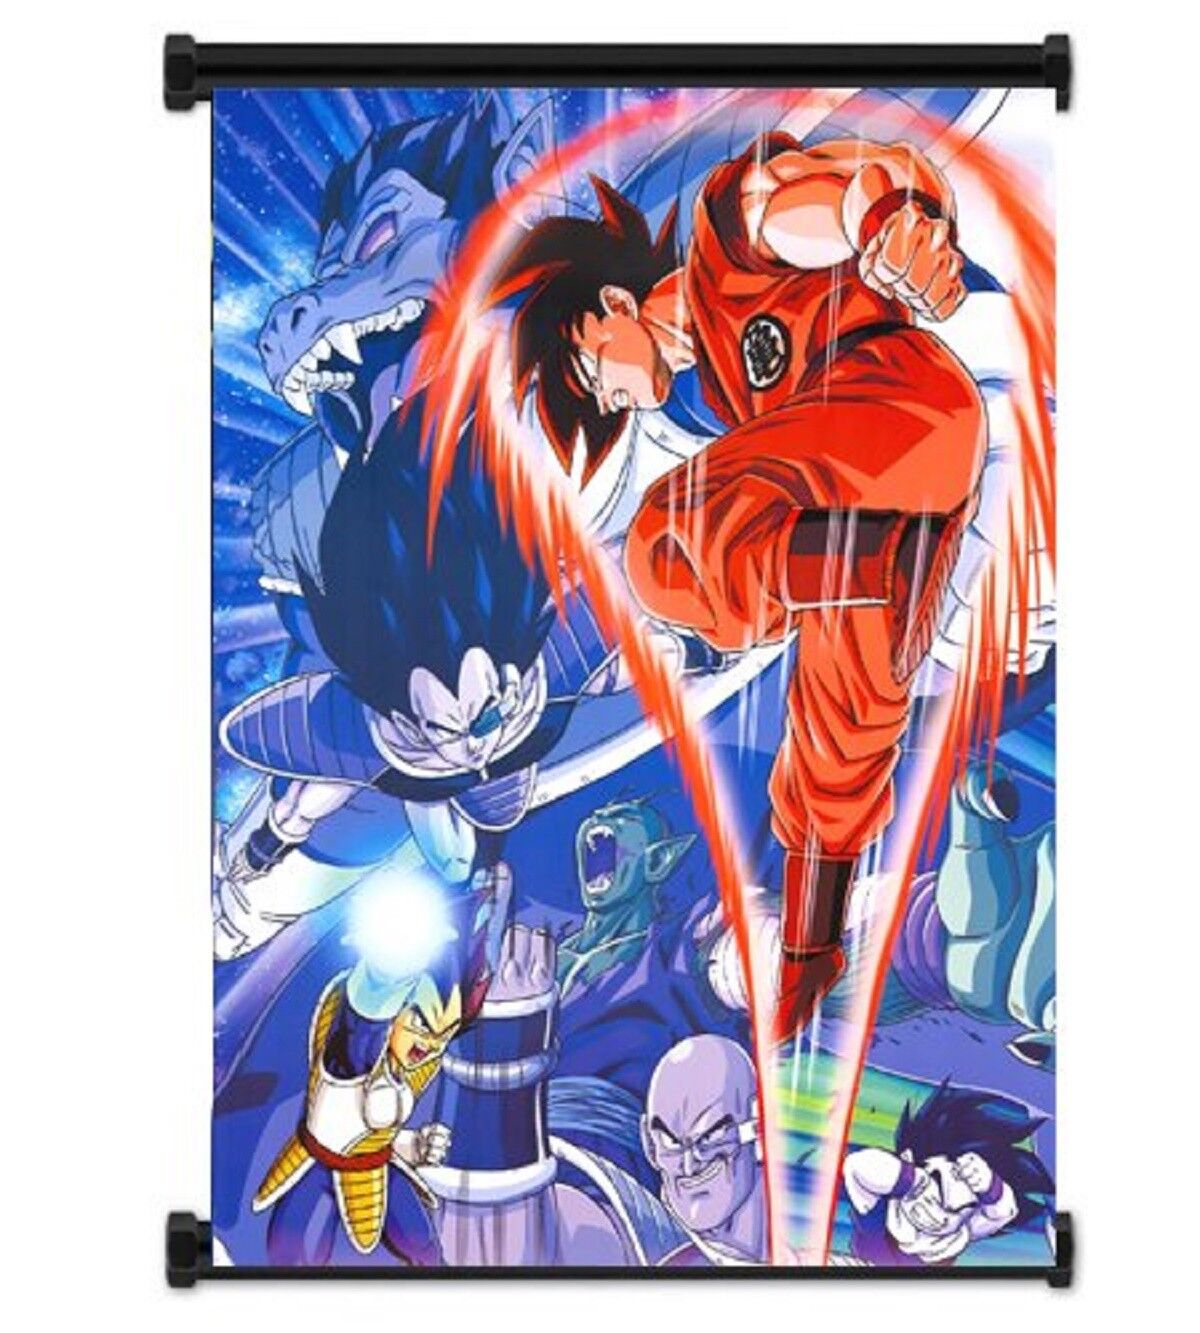 Anime DragonBall Z-Fabric Goku VS Vegeta Wall Scroll